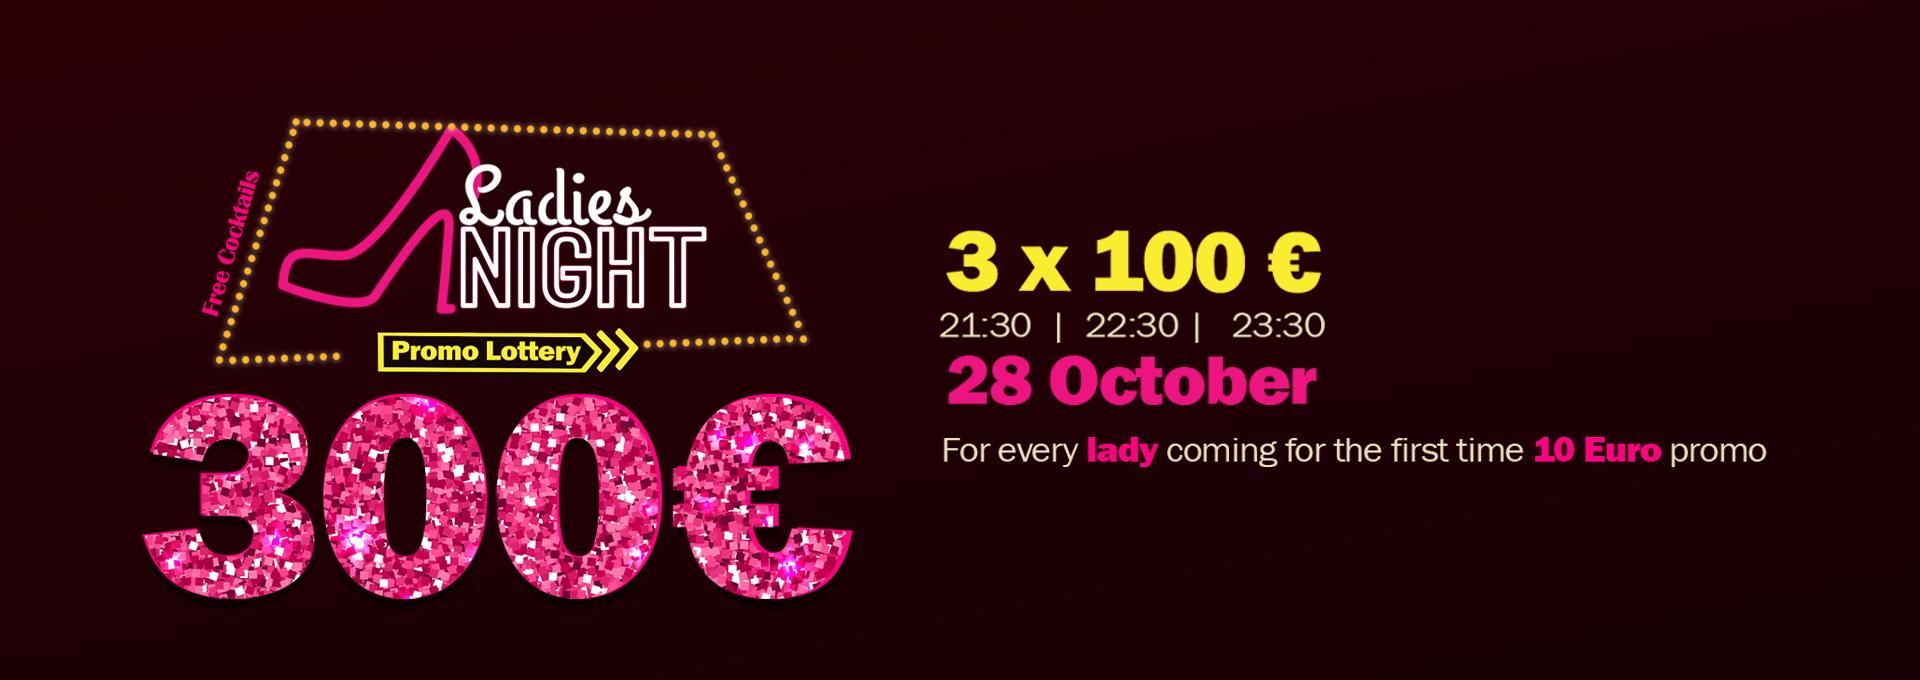 Casino Flamingo banner image